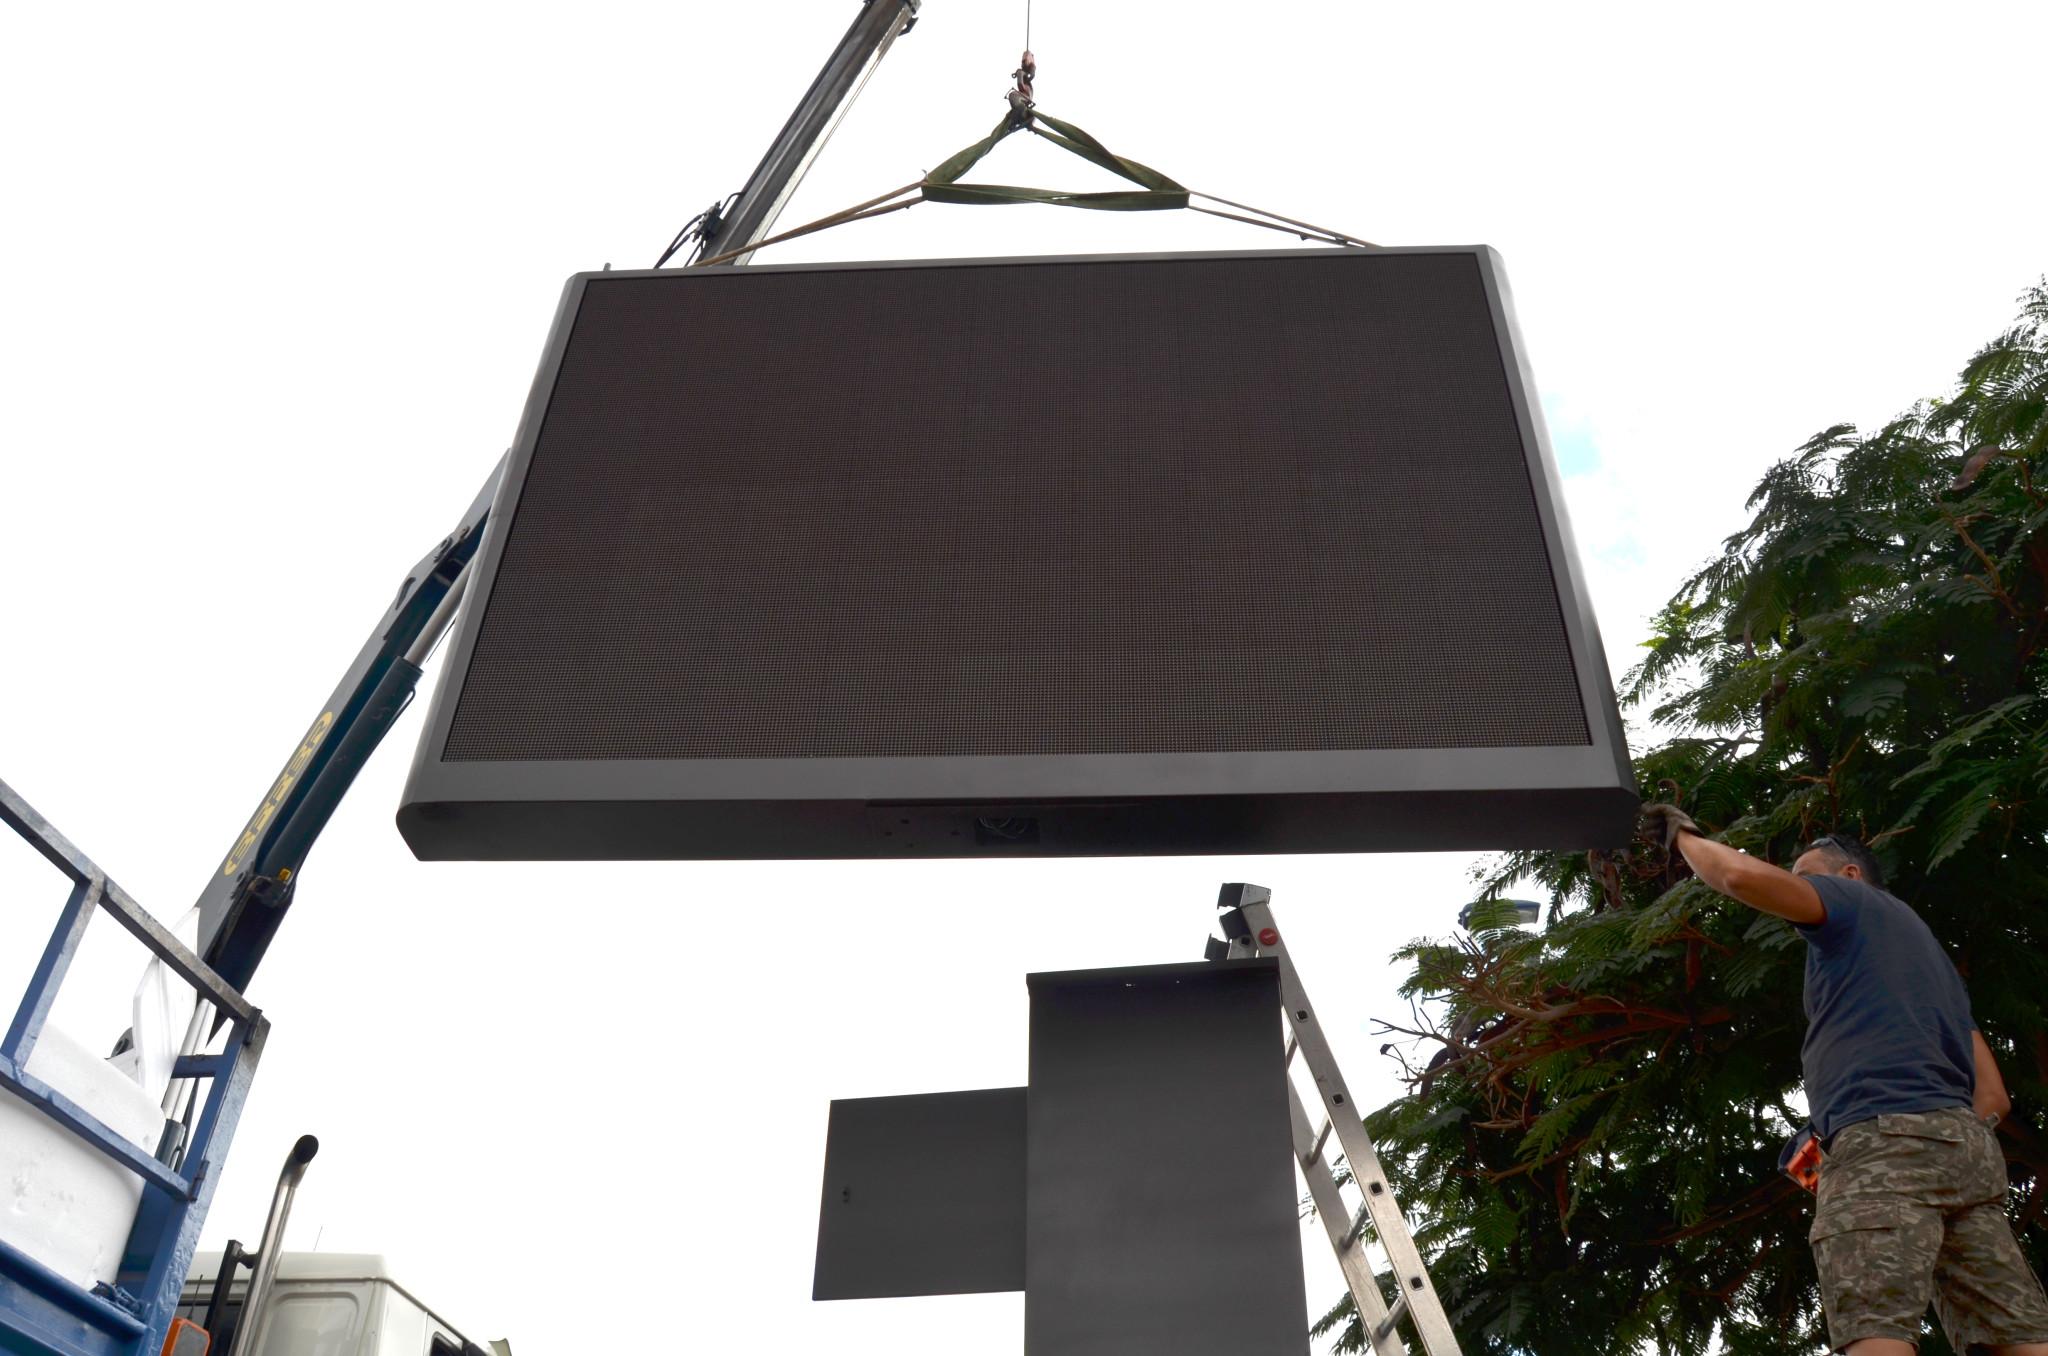 Montaje Pantalla LED Magik P10 en el C.C. Gran Sur (Adeje)